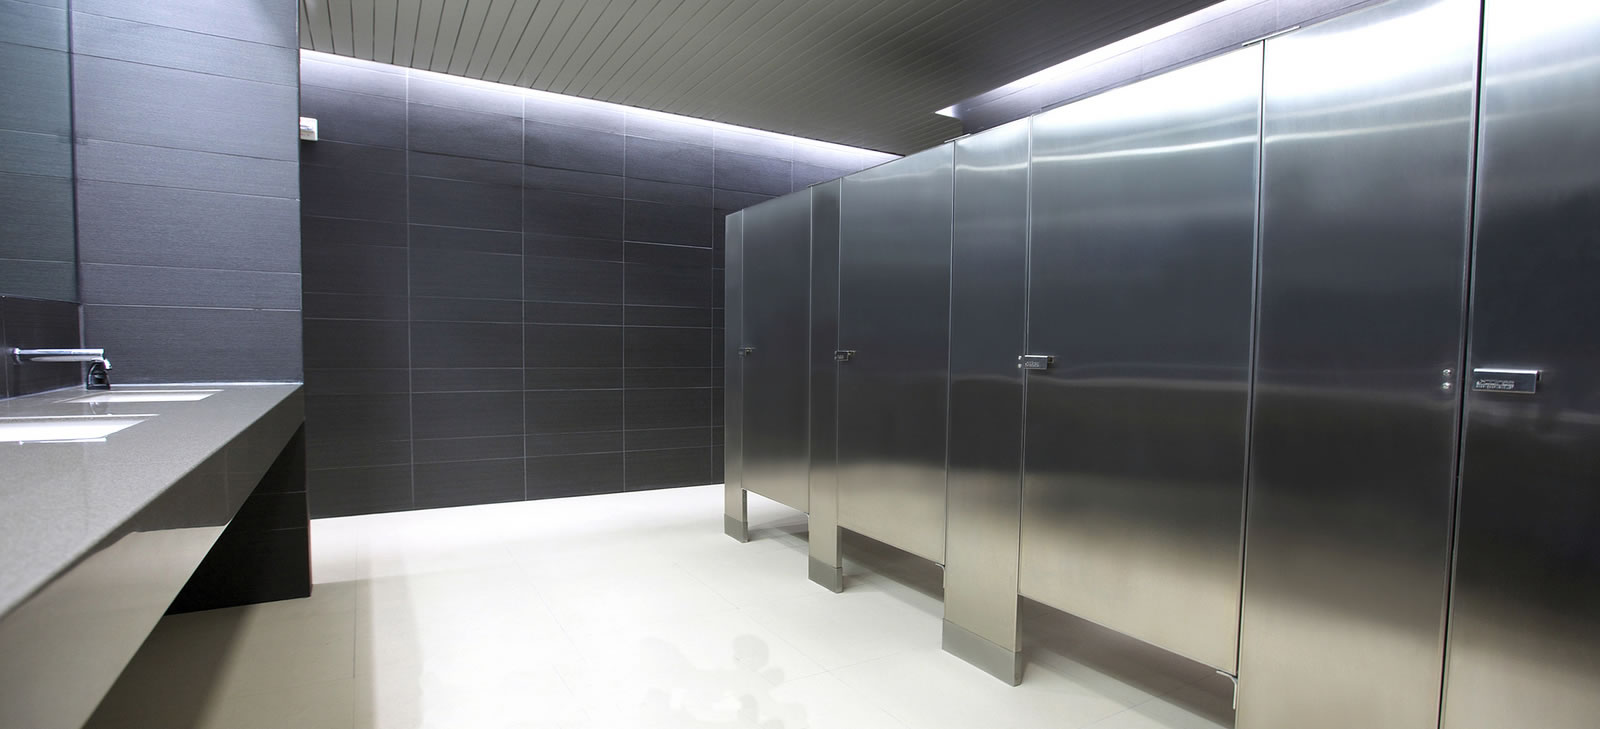 Medidas Baño De Servicio:Mamparas para sanitarios públicos, Mamparas sanitarias, Sanilock